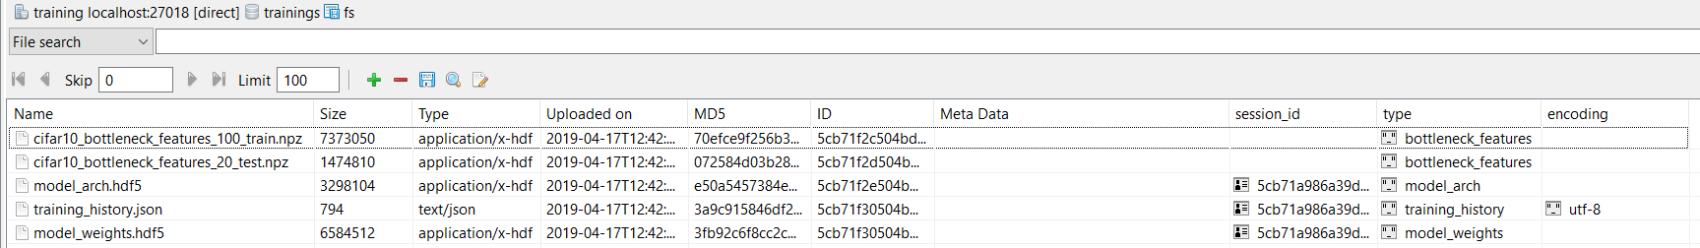 Studio 3T Screenshot Output Files